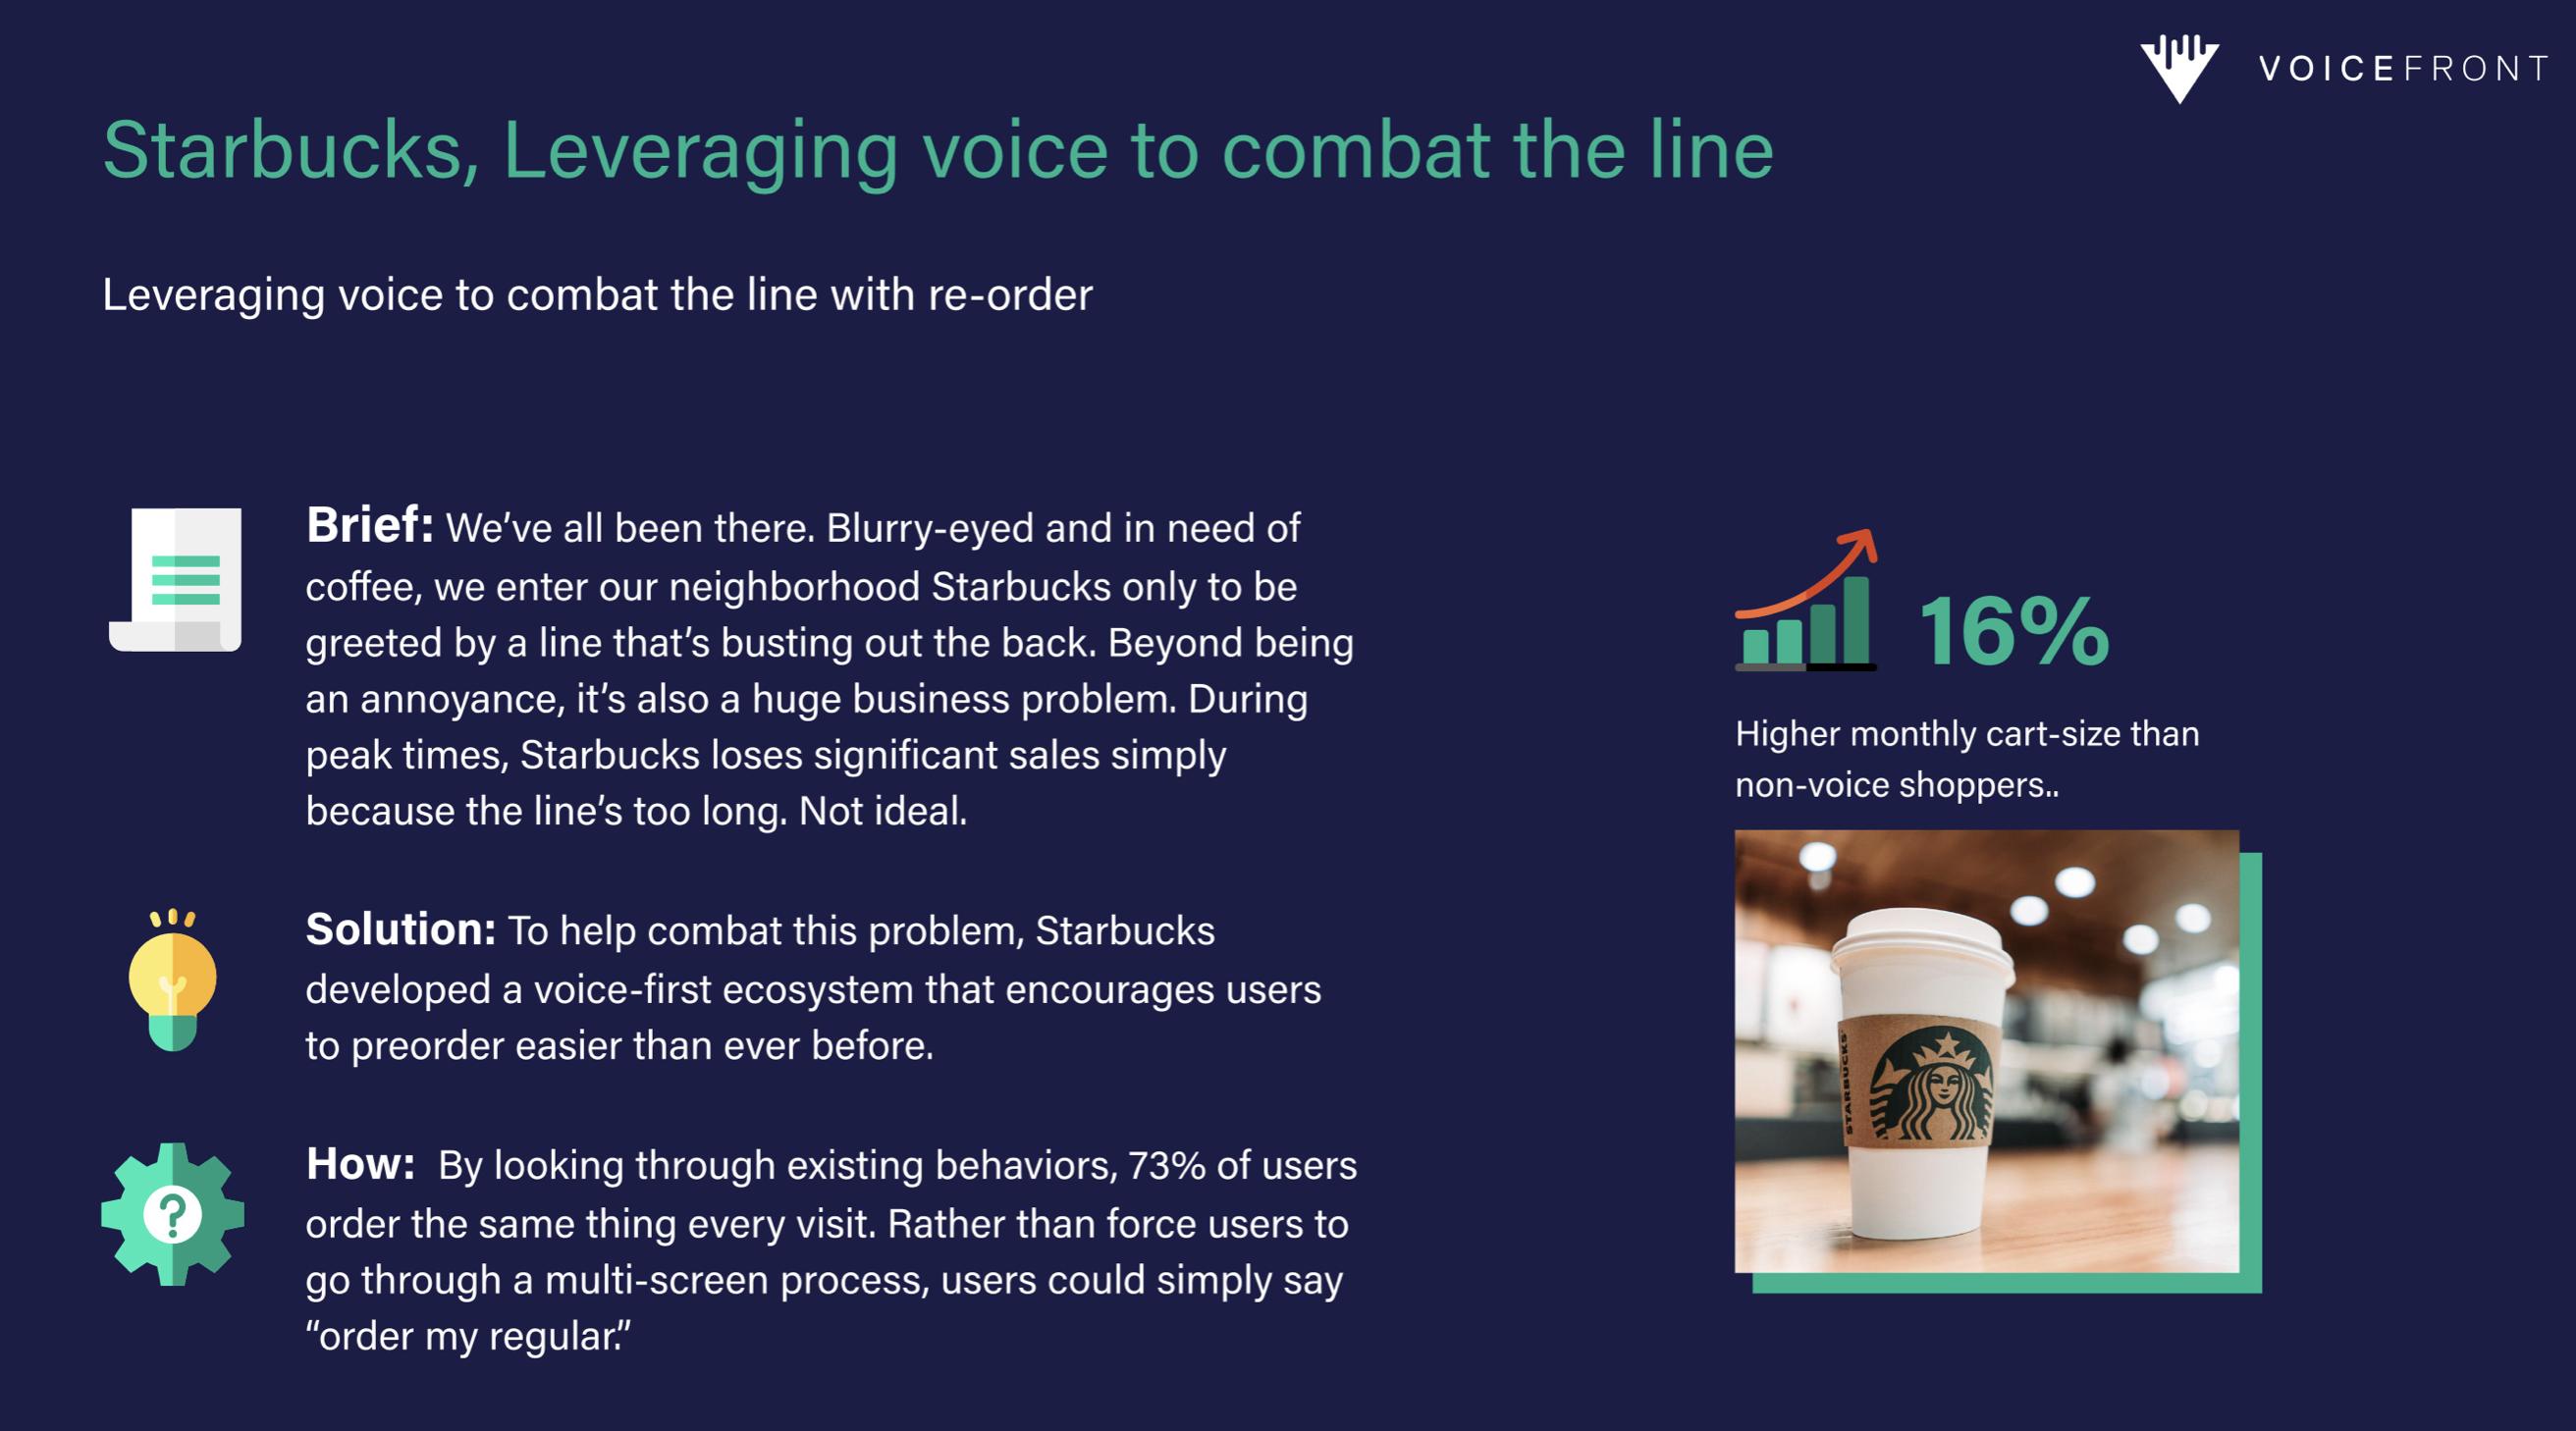 Voicefront_Starbucks Case Study